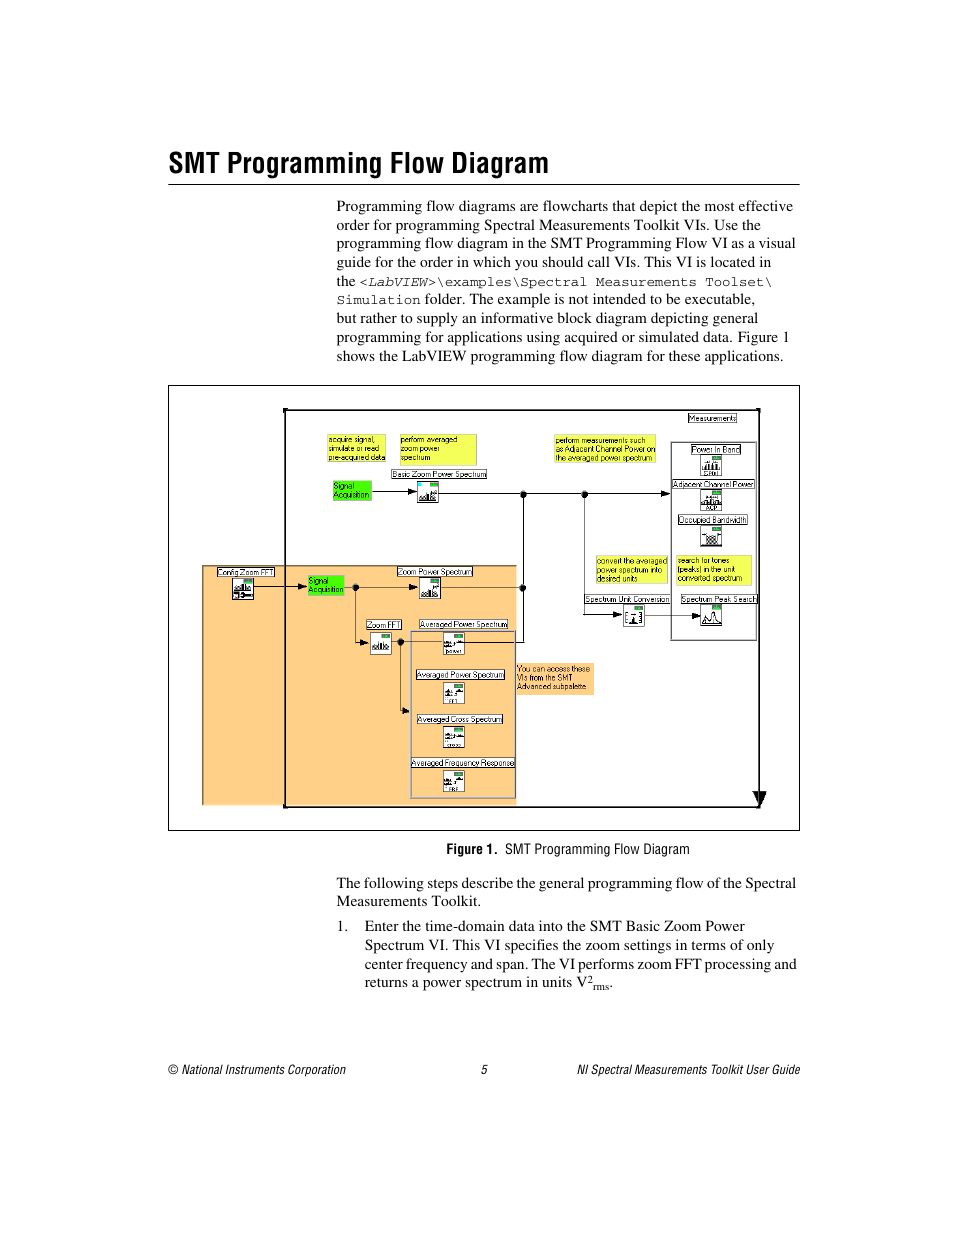 medium resolution of smt programming flow diagram figure 1 smt programming flow diagram national instruments ni spectral measurements toolkit user manual page 5 35